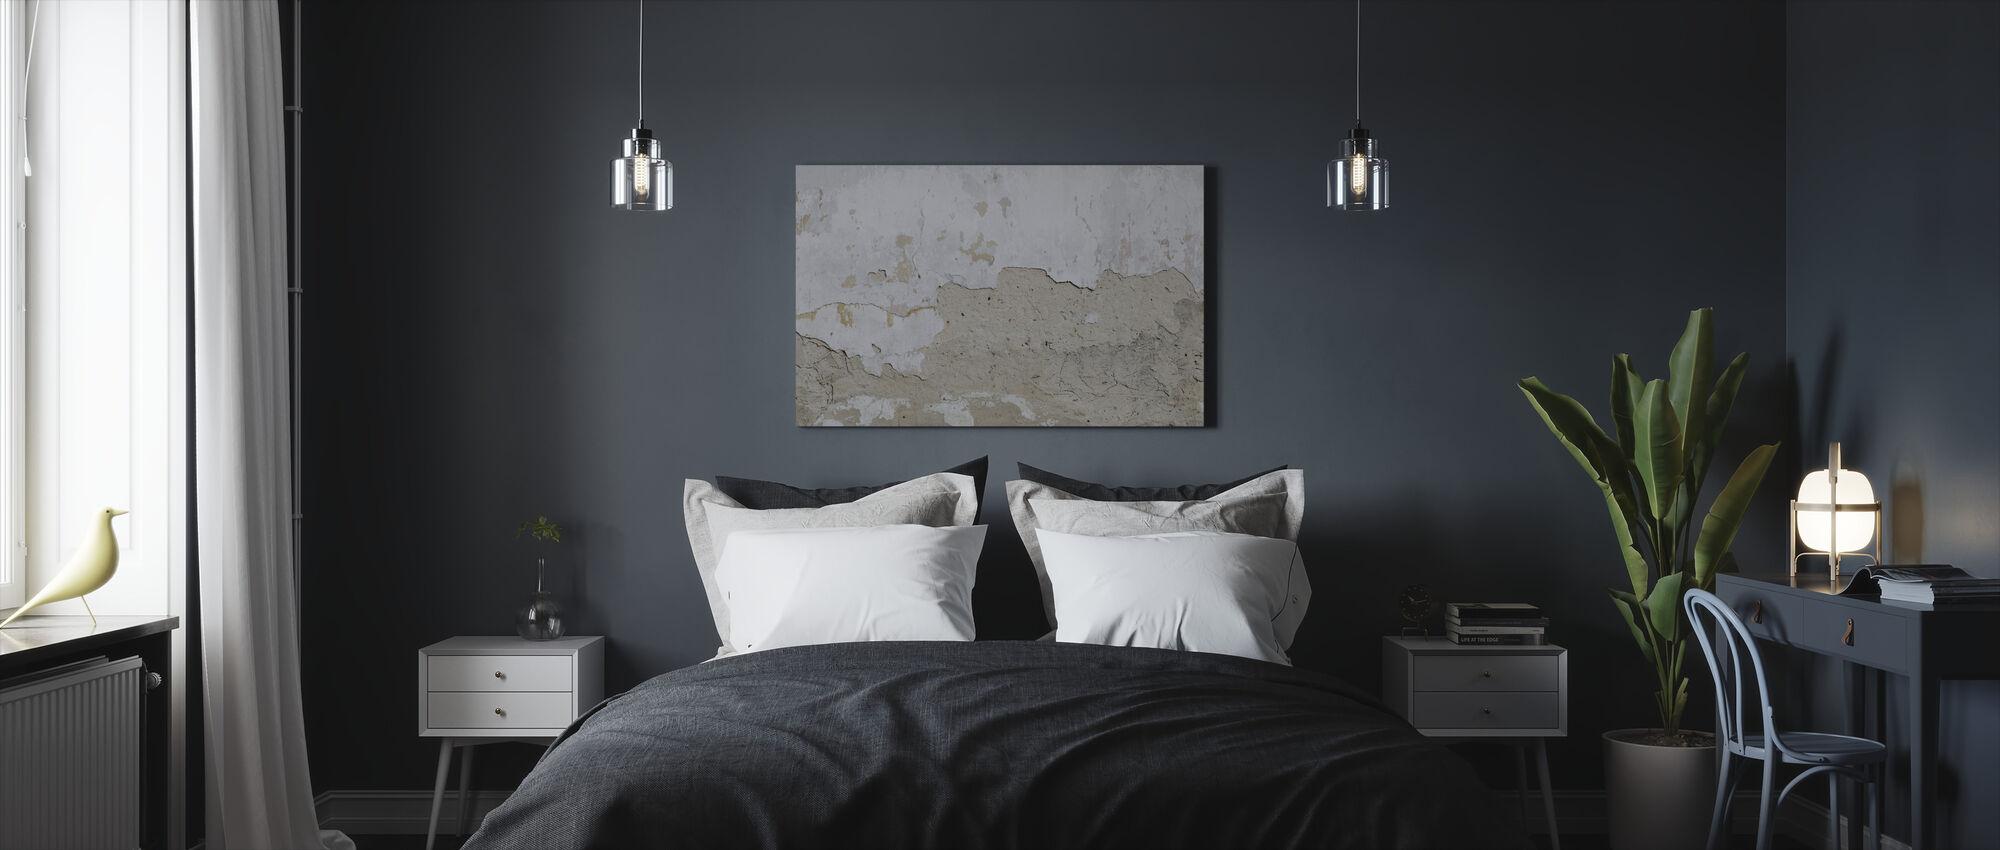 Concrete Wall - Canvas print - Bedroom